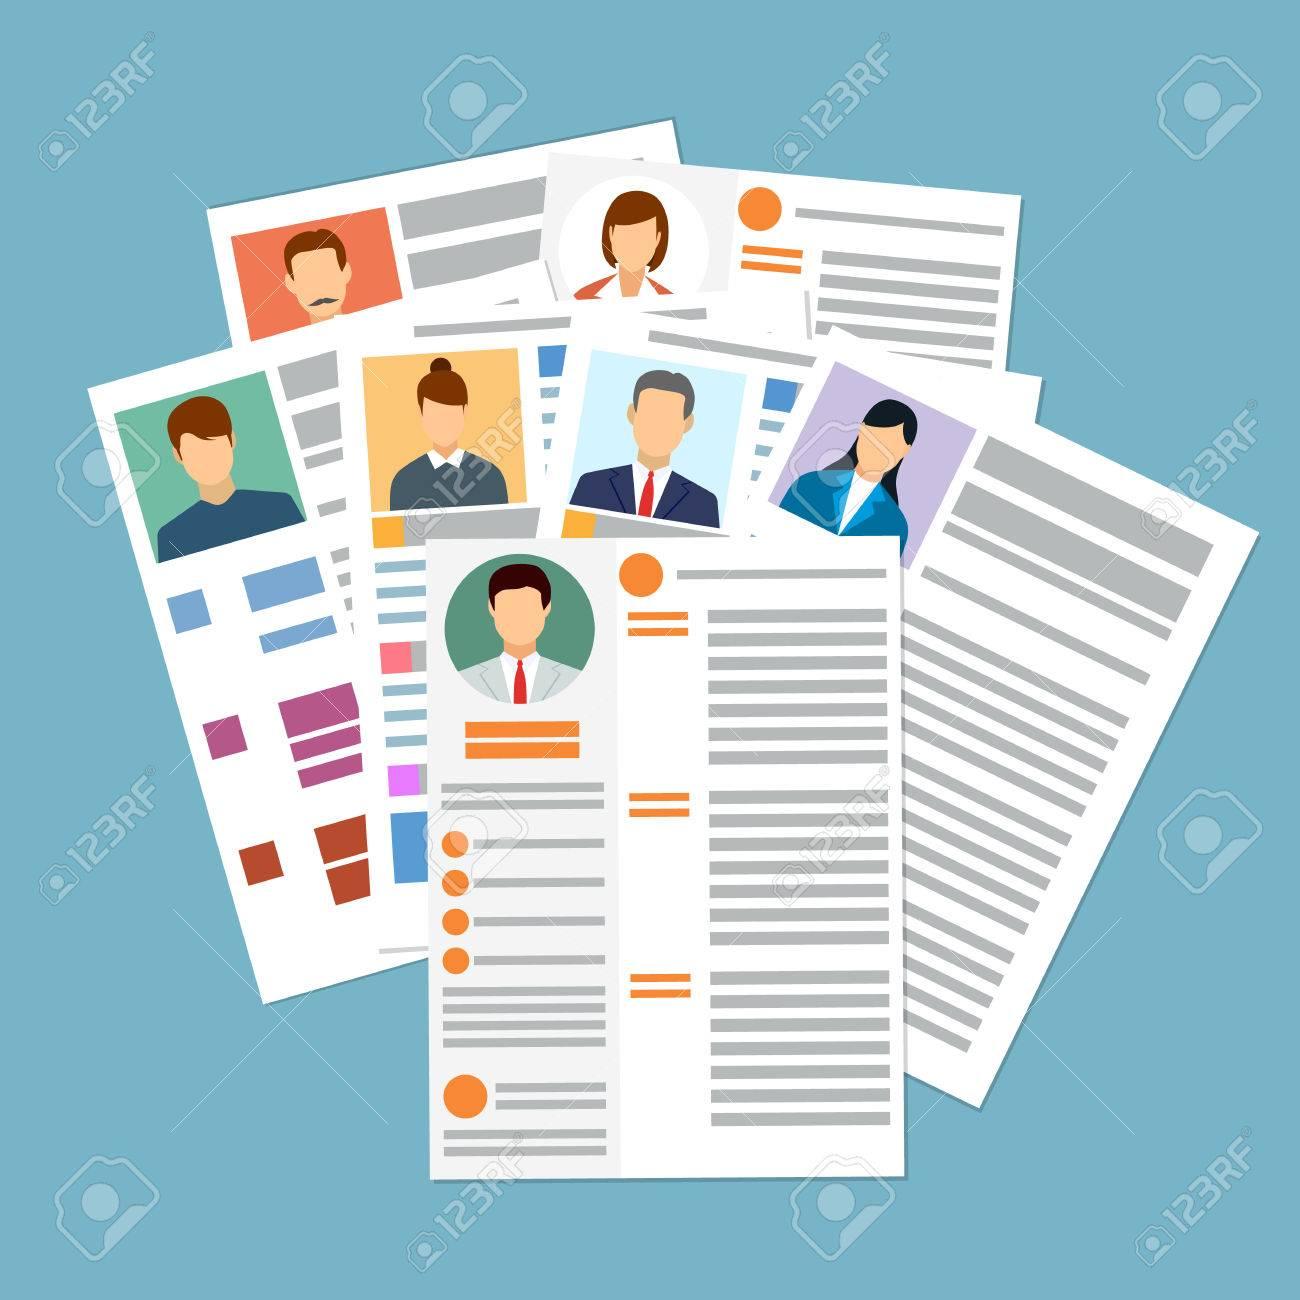 71adc2acdd3 Cv concepto de curriculum vitae con foto, documentos. contratación de empleo.  La búsqueda